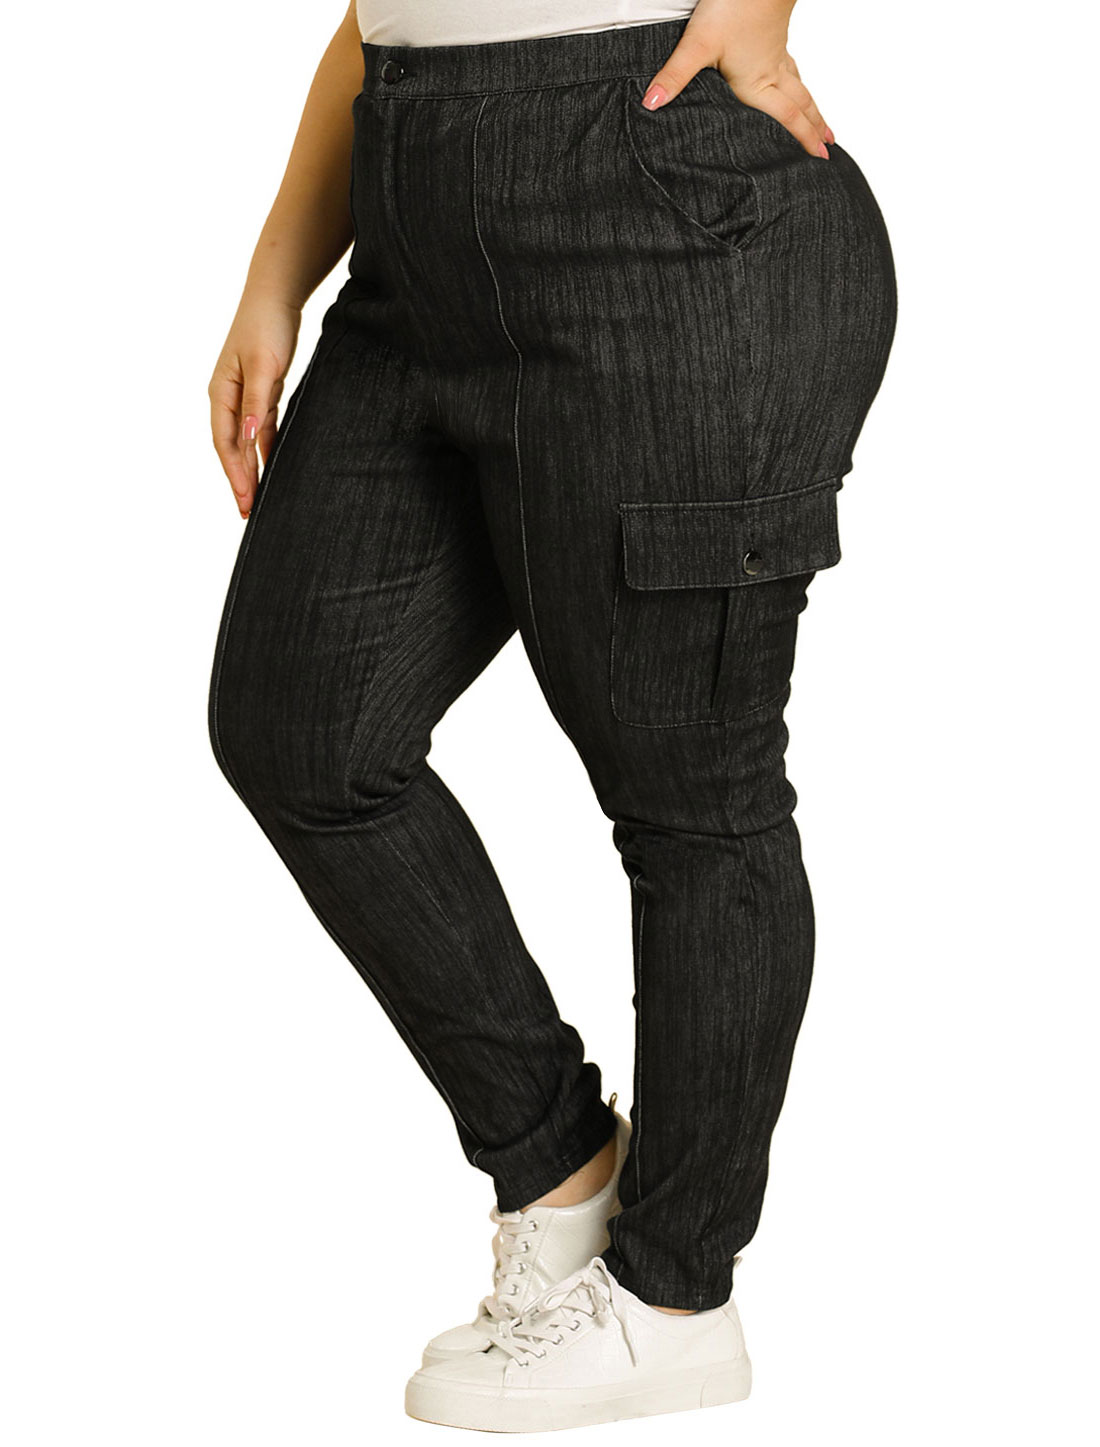 Women's Plus Size Joggers Skinny Contrast Color Ponte Casual Pants Black 4X